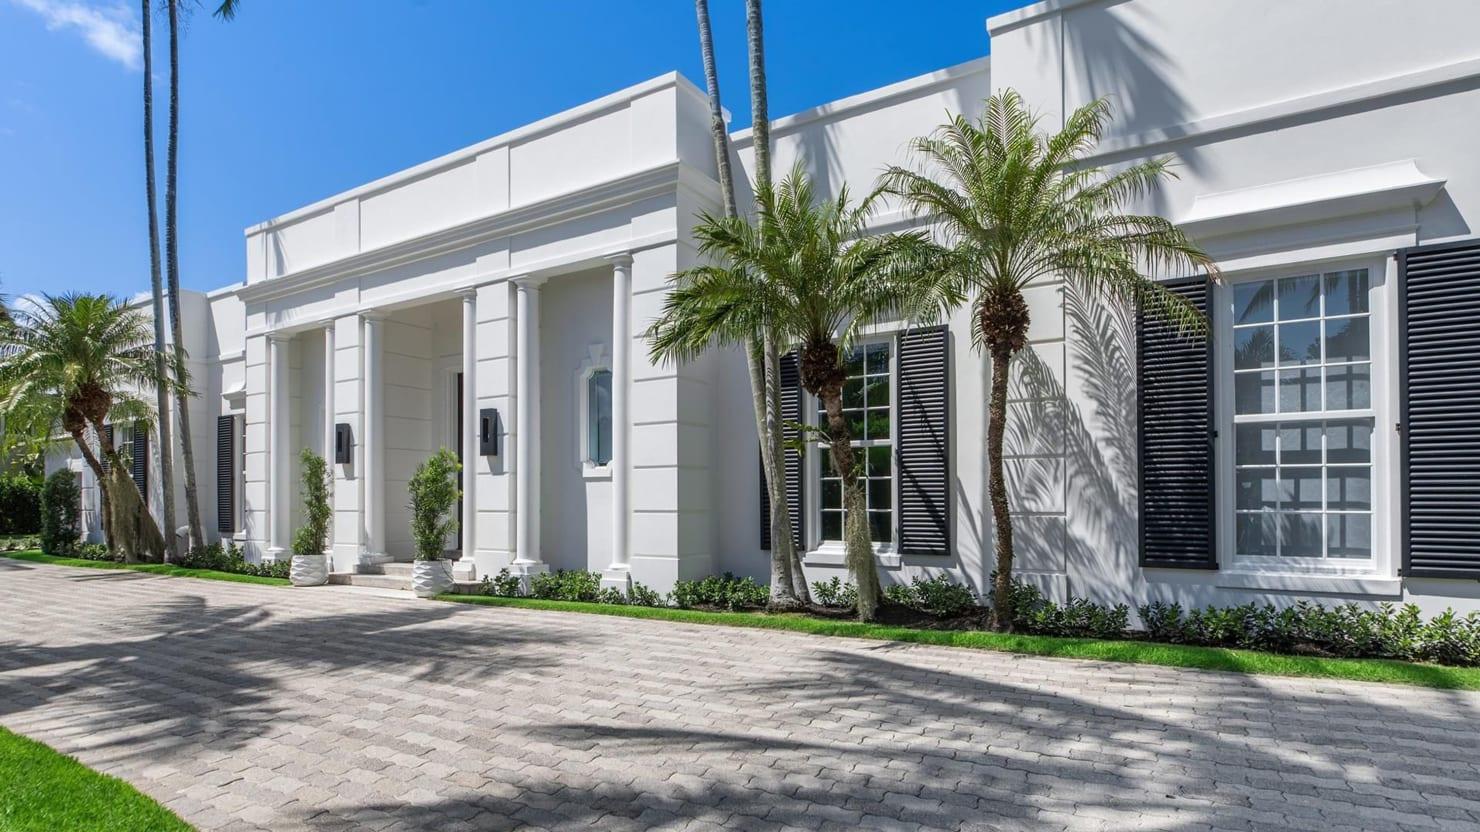 OMG, I Want This House: Palm Beach, FL